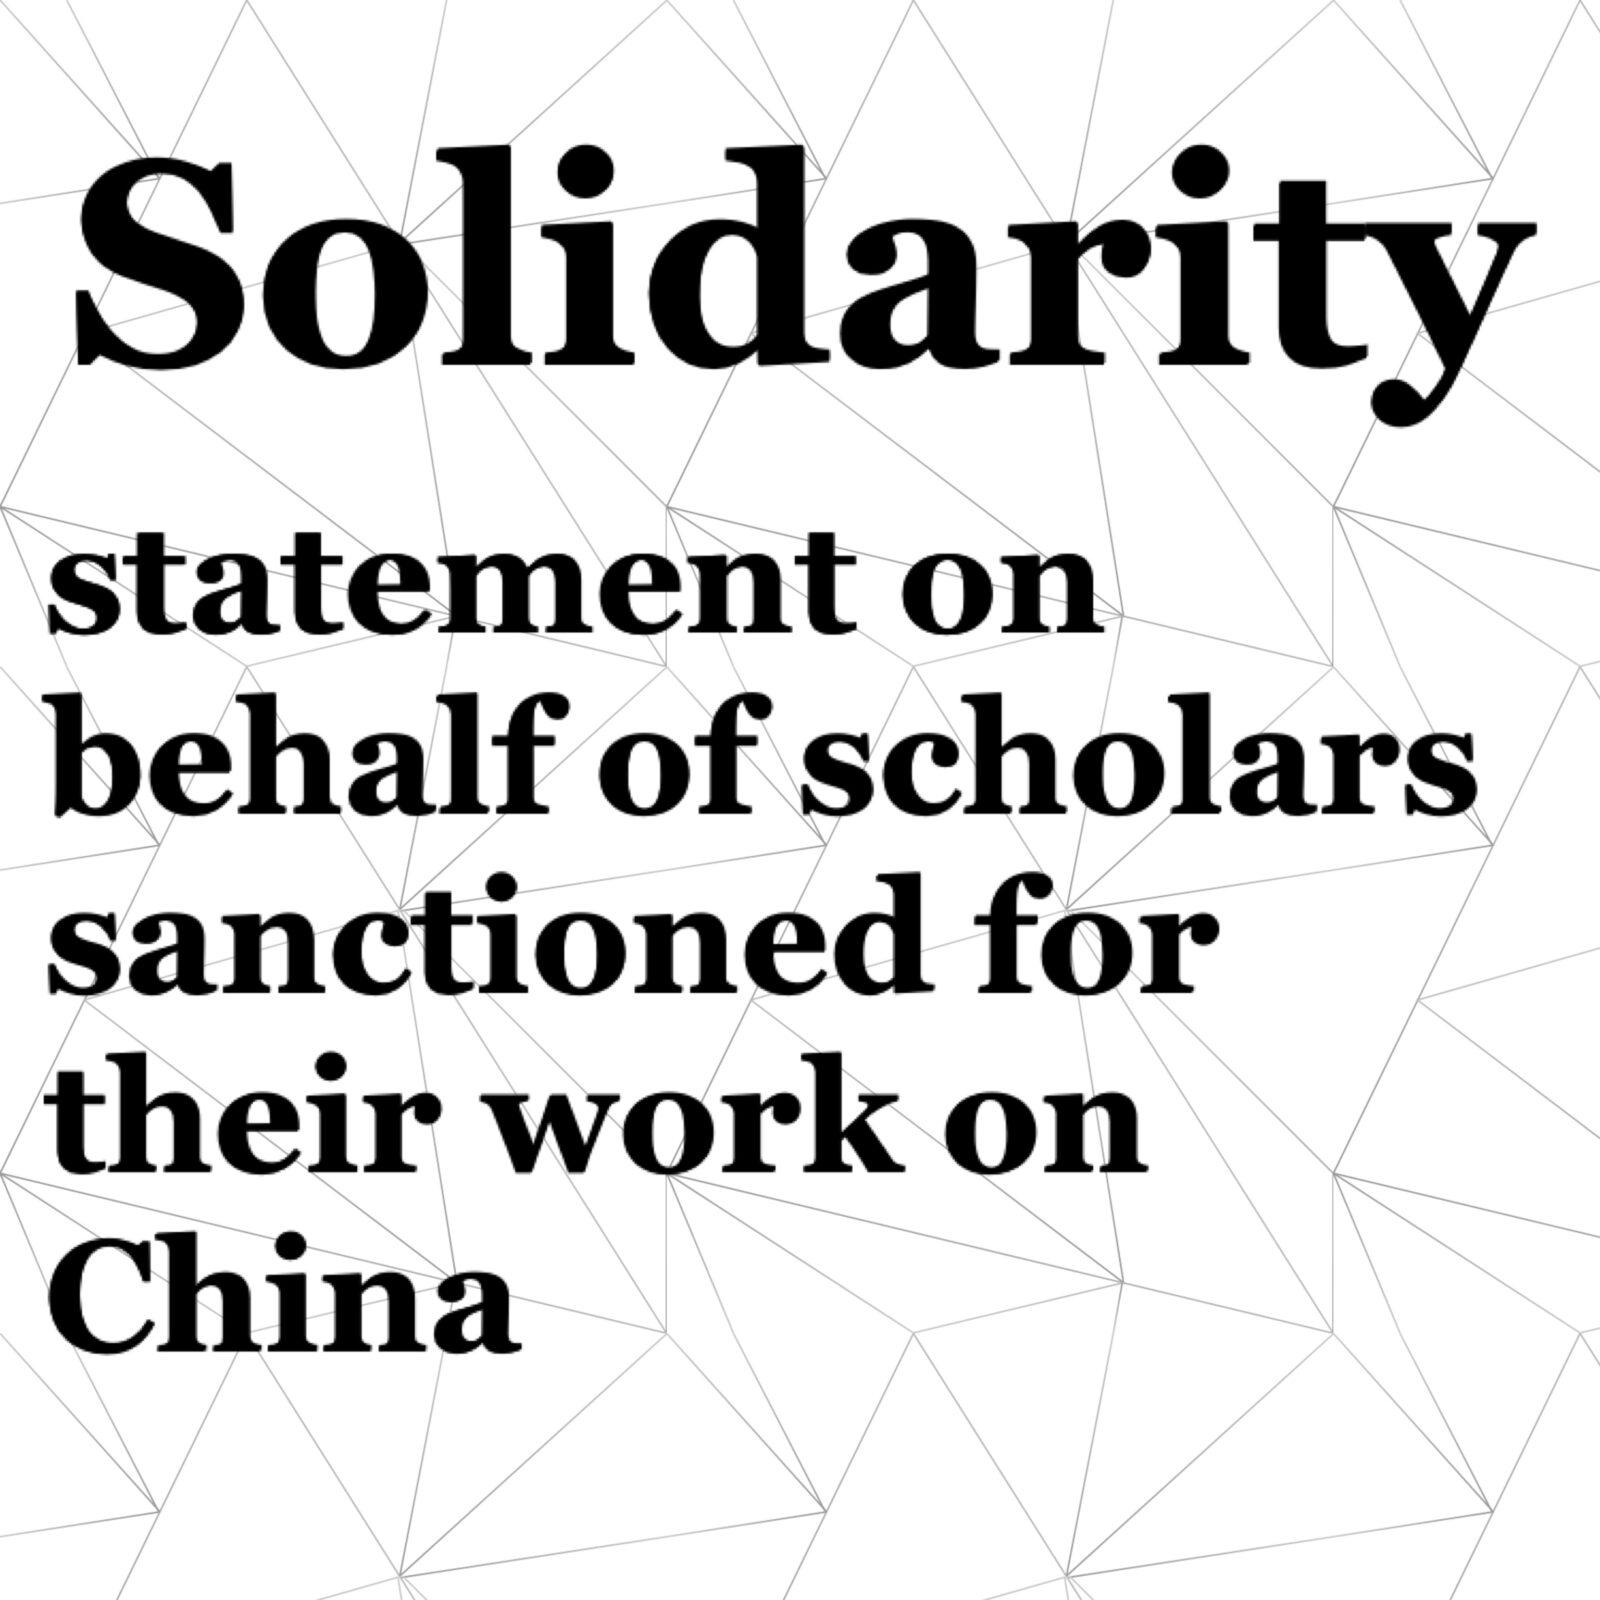 Solidarity statement on behalf of scholars sanctioned for their work on China / 学界联署声明:声援因从事中国研究而被制裁之学者